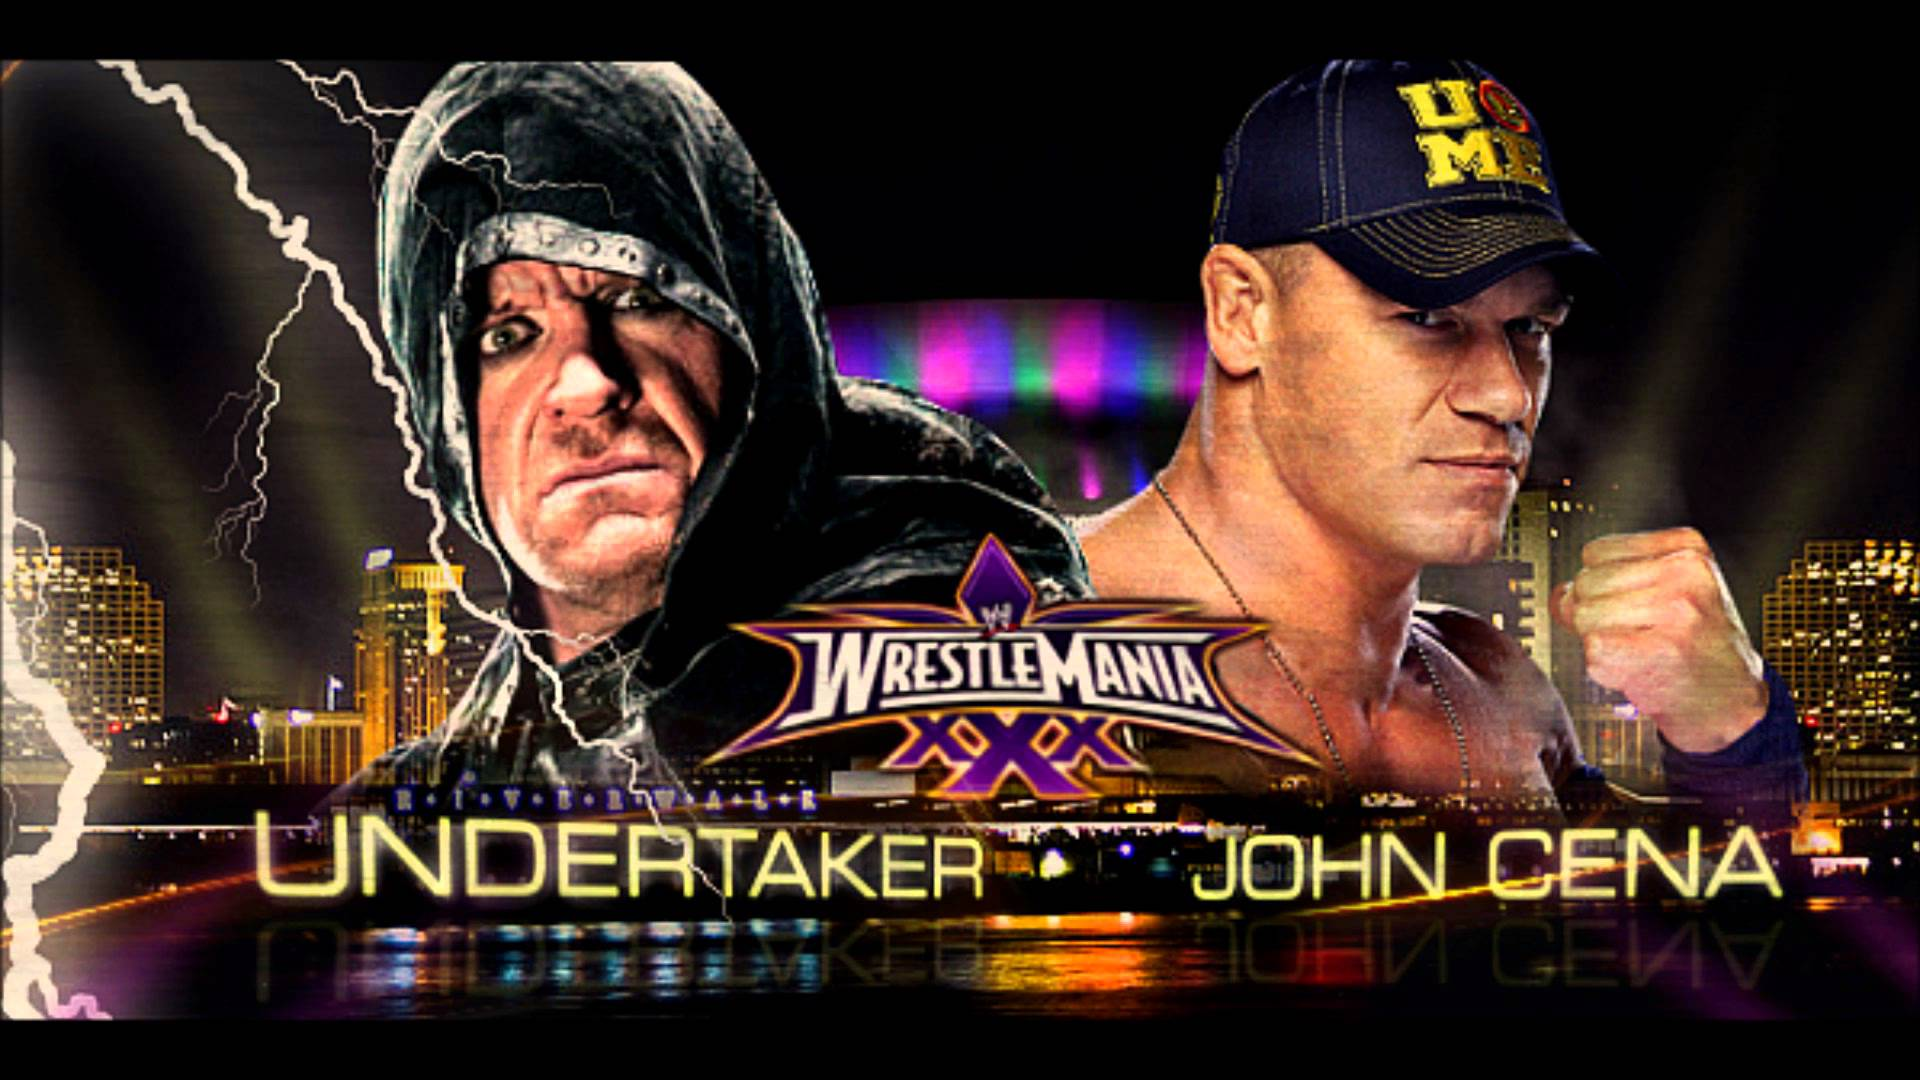 Undertaker Vs John Cena Wrestlemania 30 Title vs Streak...